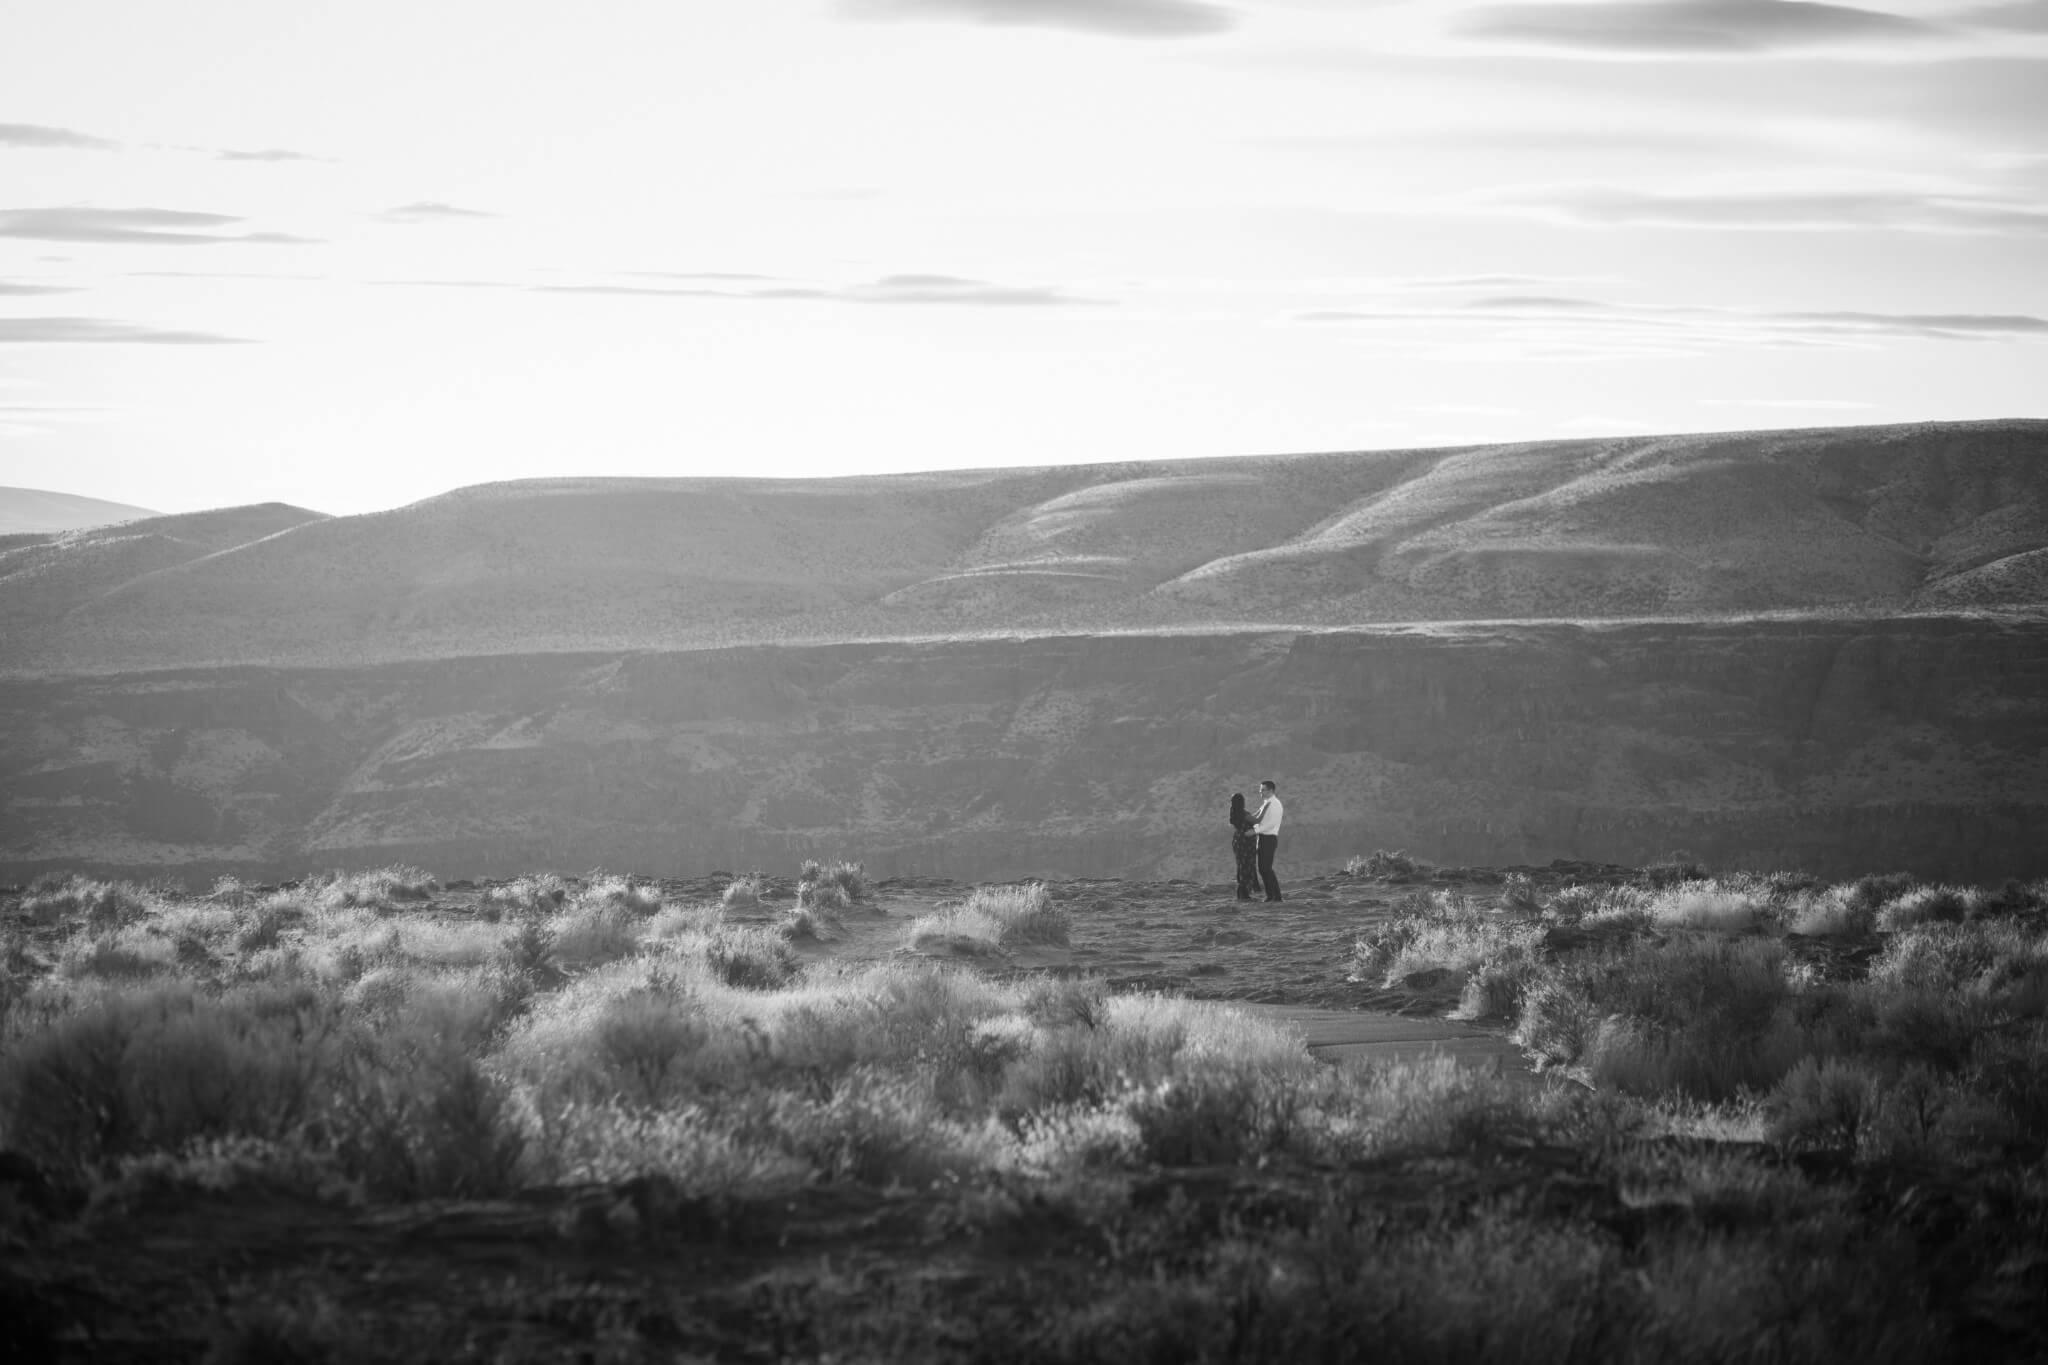 Lesly & Michael Vantage Engagement by Bill Weisgerber Spokane Photographer (17 of 71).jpg